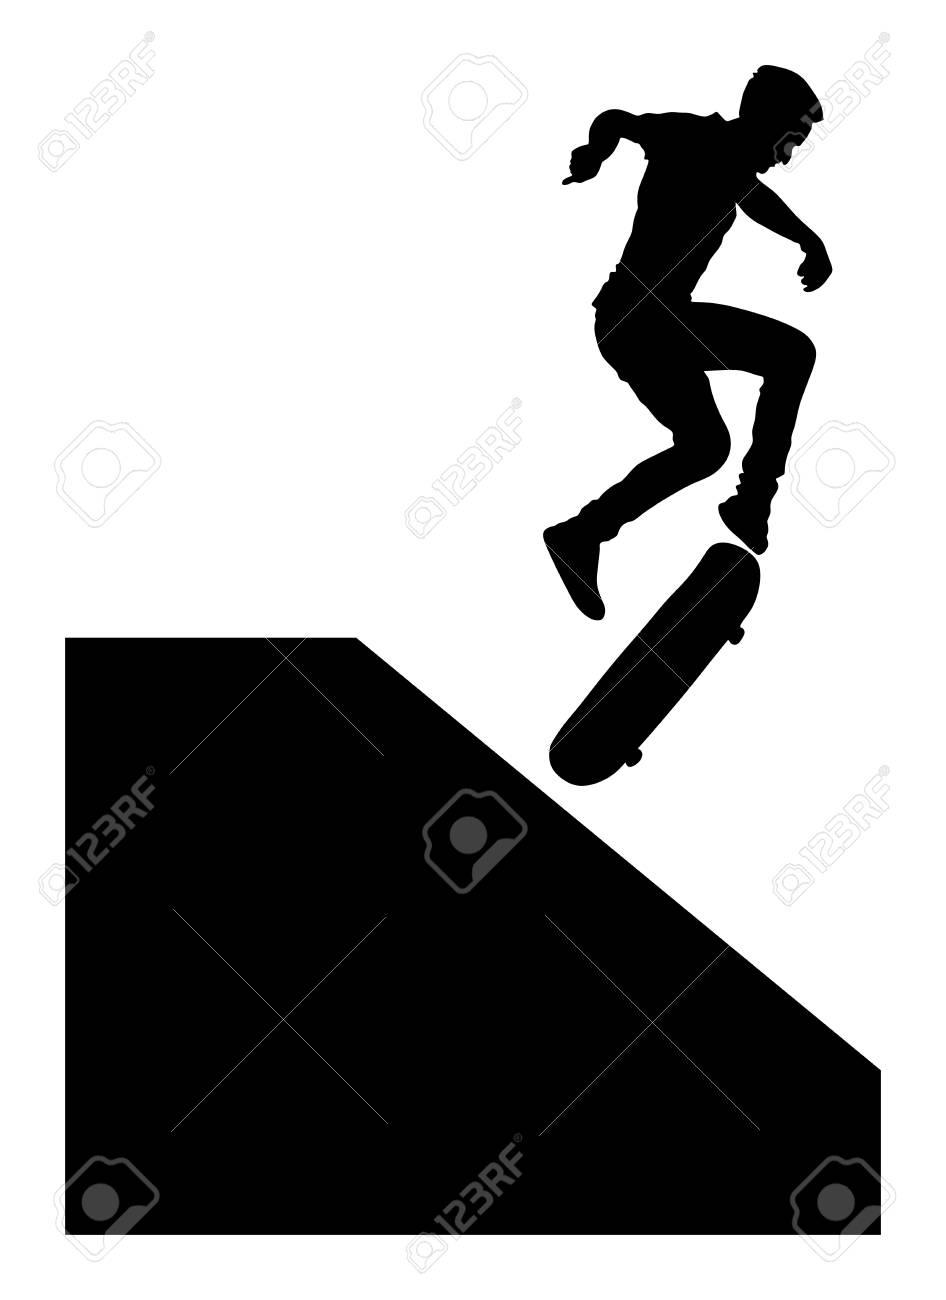 clipart #cartoon A Woman Doing The Angle Forward Bend Yoga Pose and An  Urban Skate Park Background - Vendor: vectorto… | Skate park, Skate,  Cropped black leggings